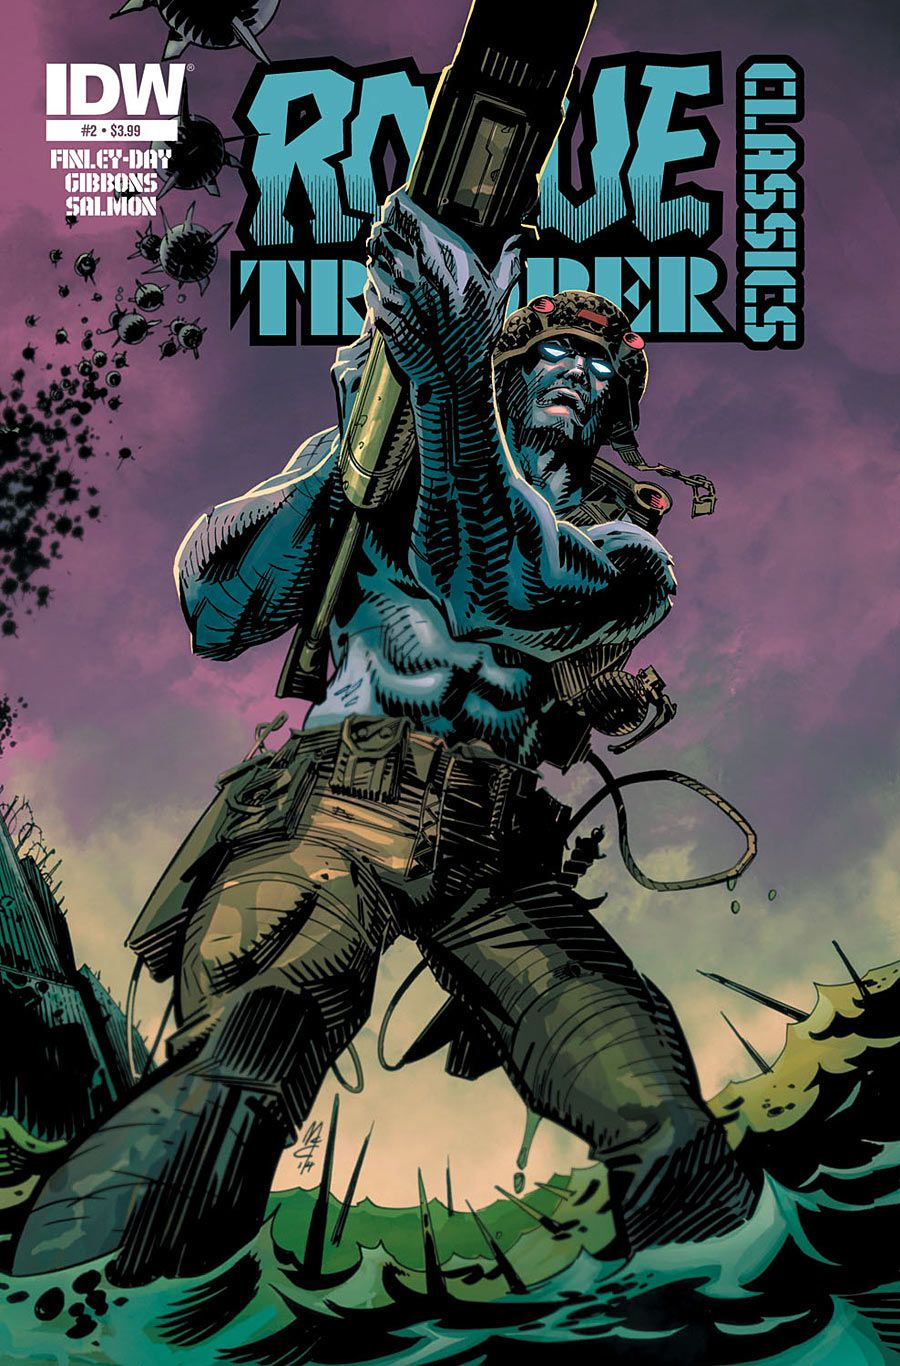 Rogue Trooper #4 Subscription Variant Comic Book 2014 IDW